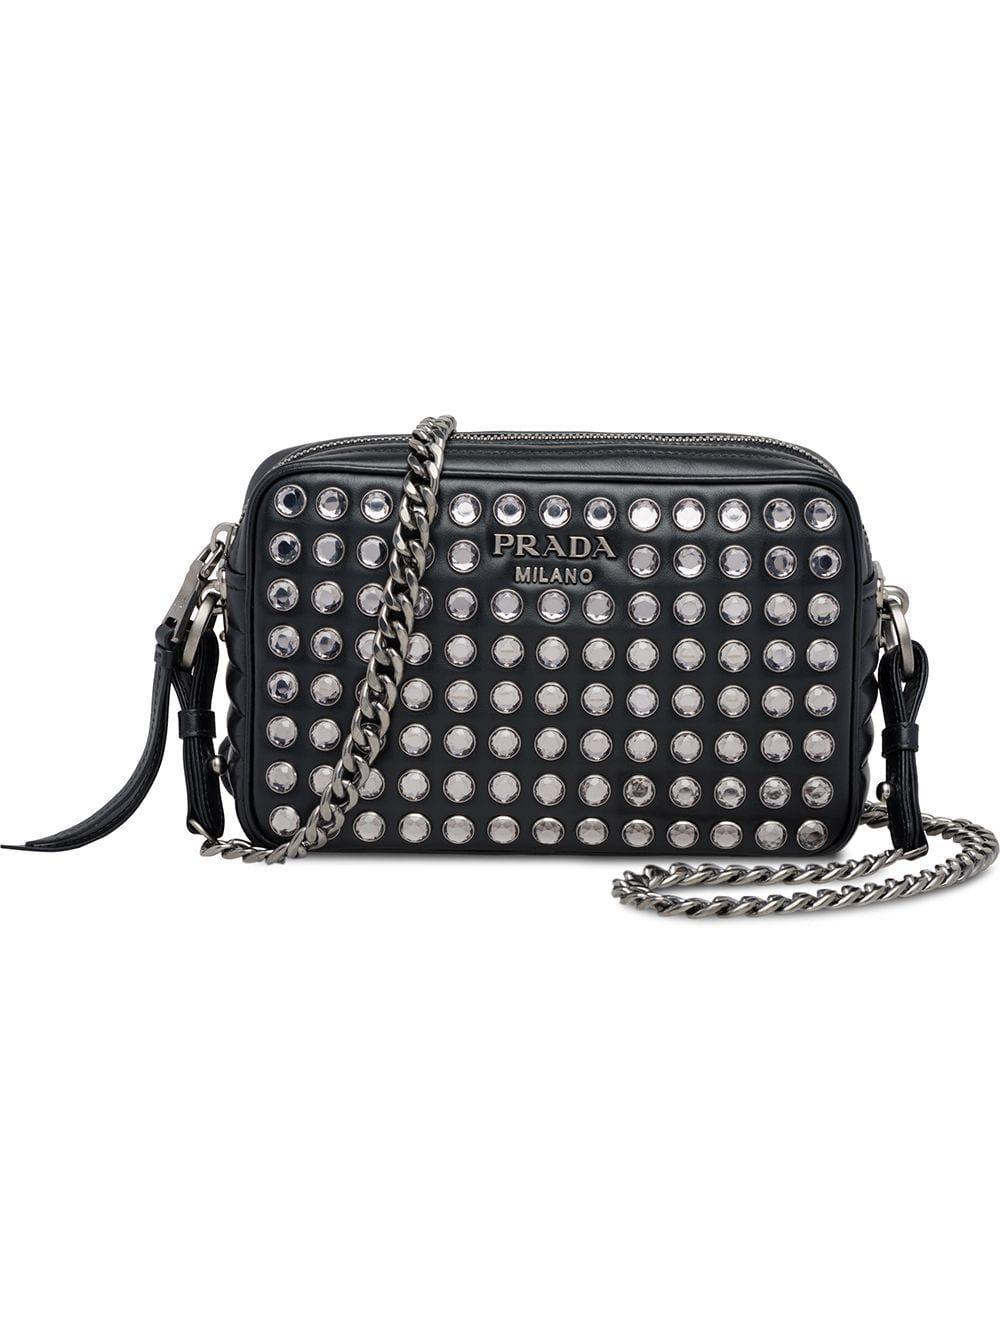 cdb0fa7c6b75 PRADA PRADA DIAGRAMME BAG WITH CRYSTALS - BLACK. #prada #bags #crystal  #leather #accessories #shoulder bags #wallet #charm